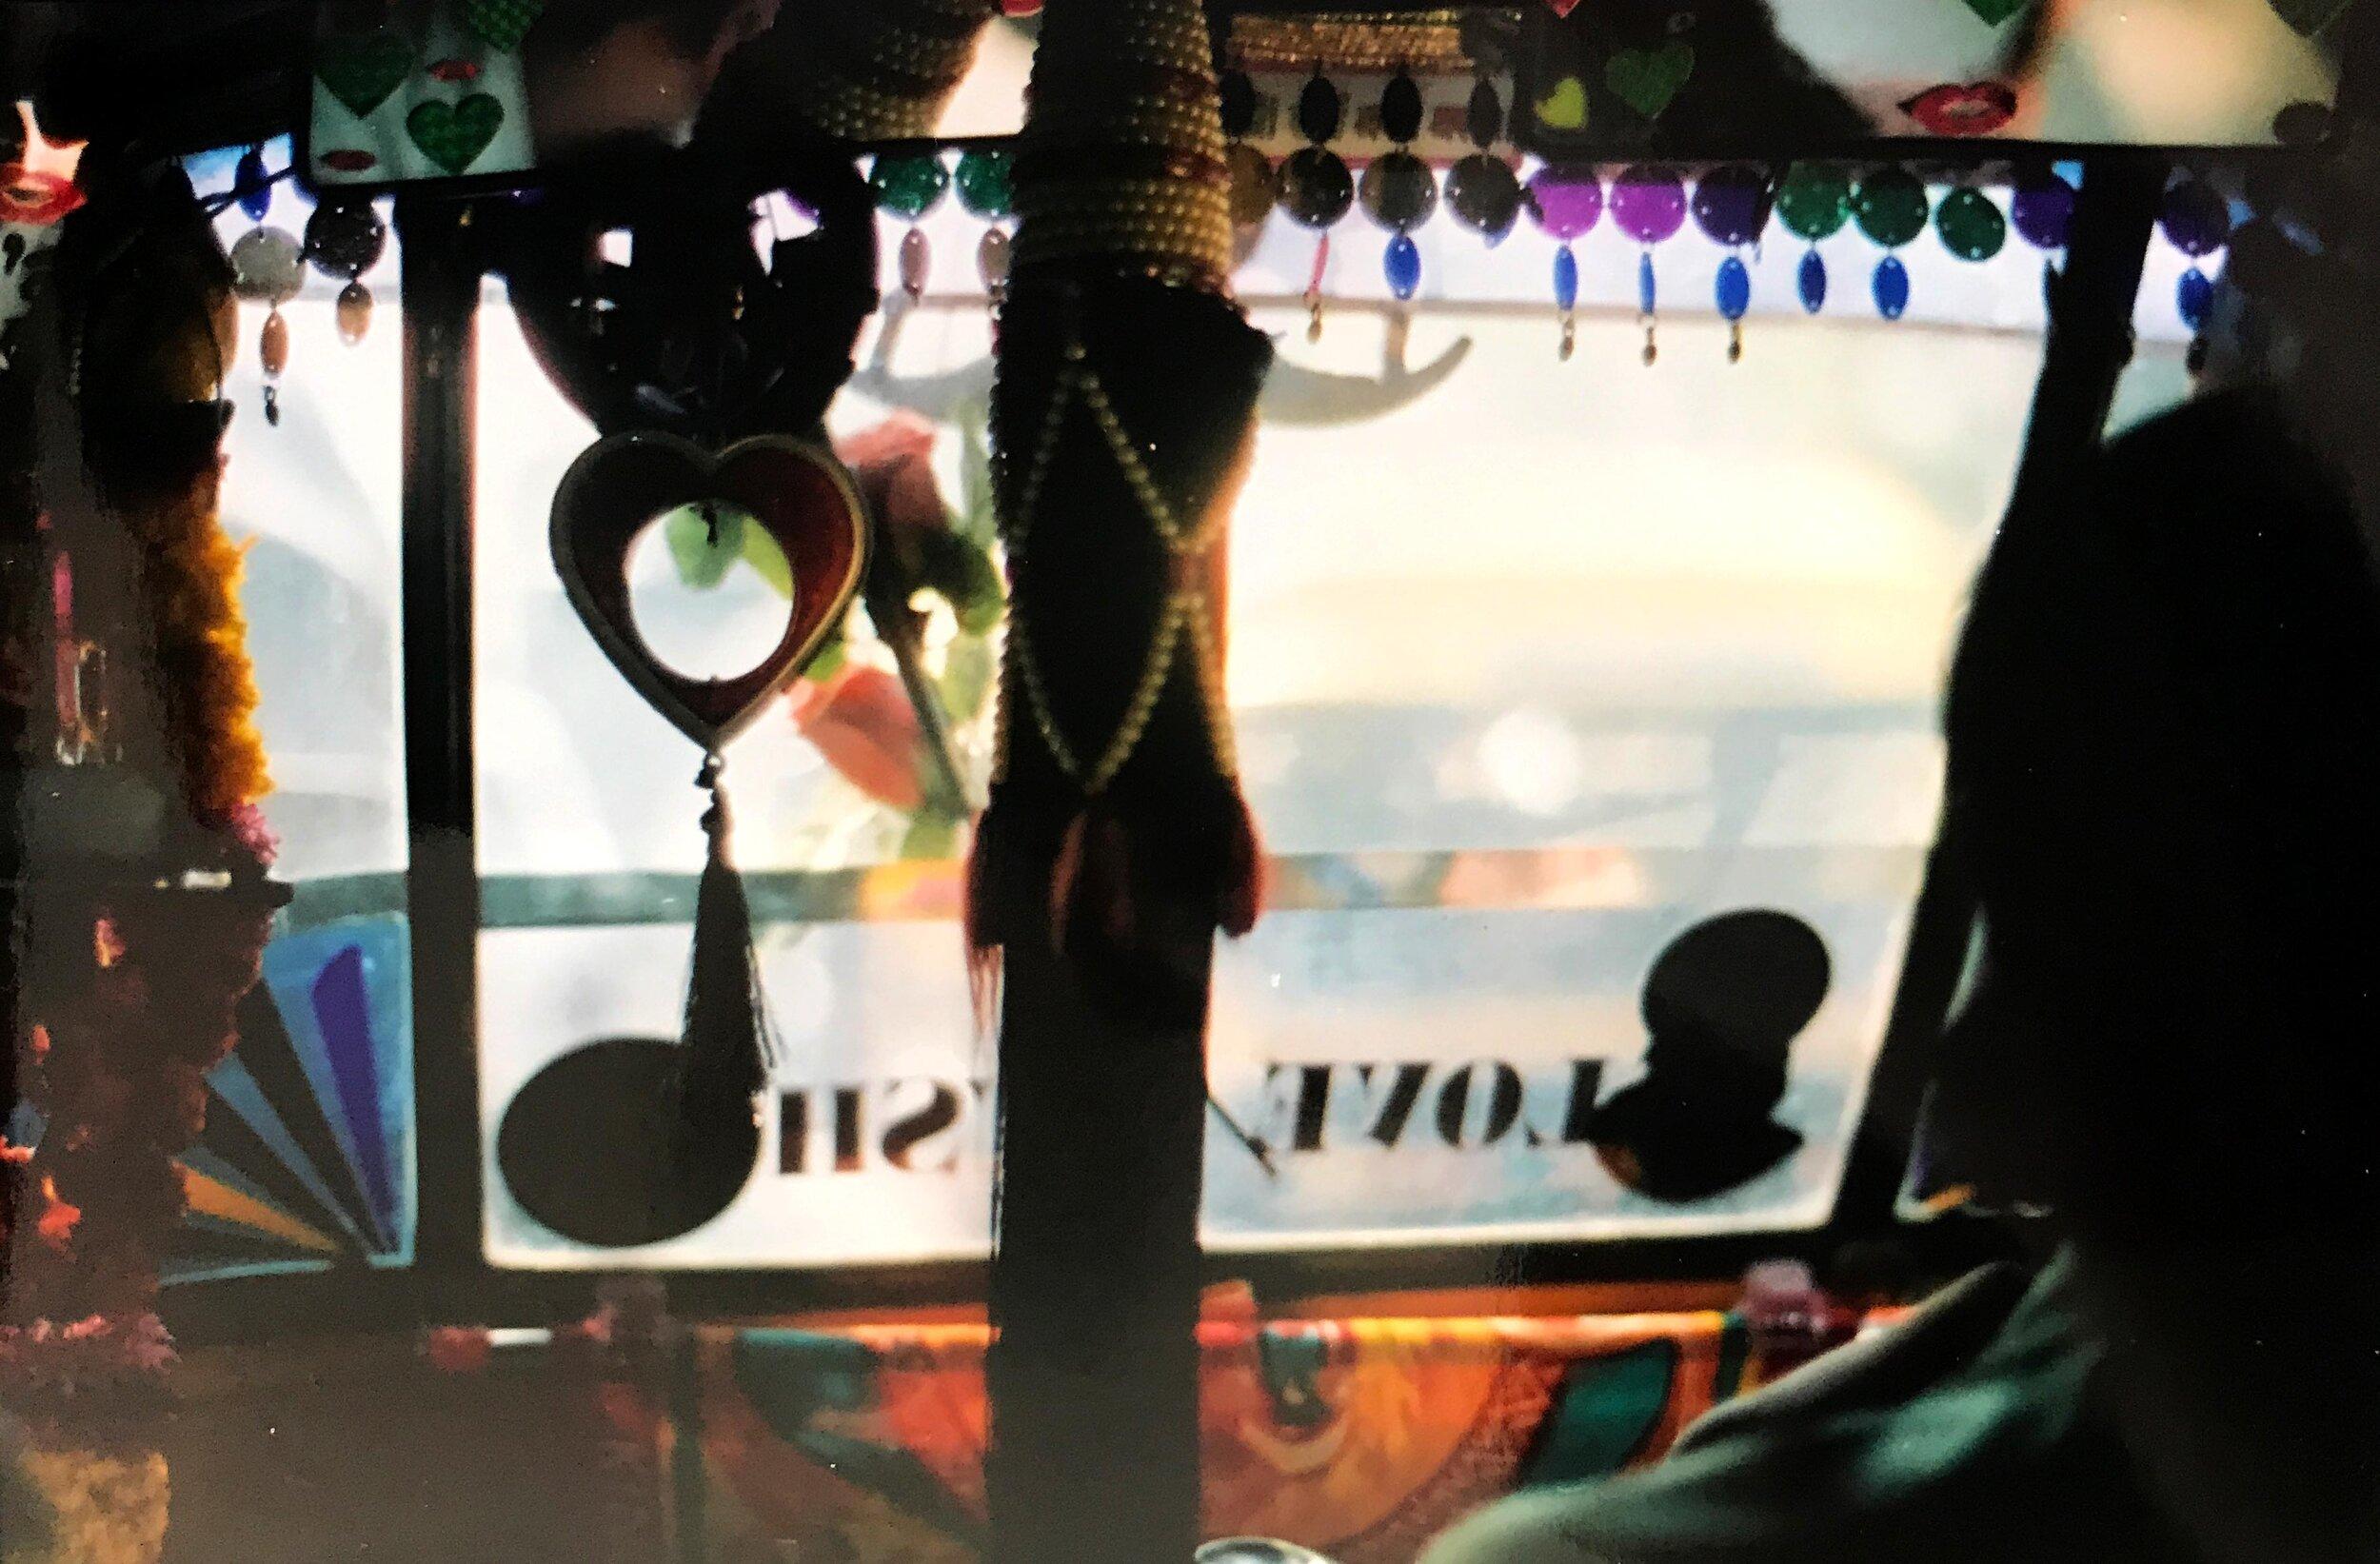 Inside of a rickshaw in Mumbai